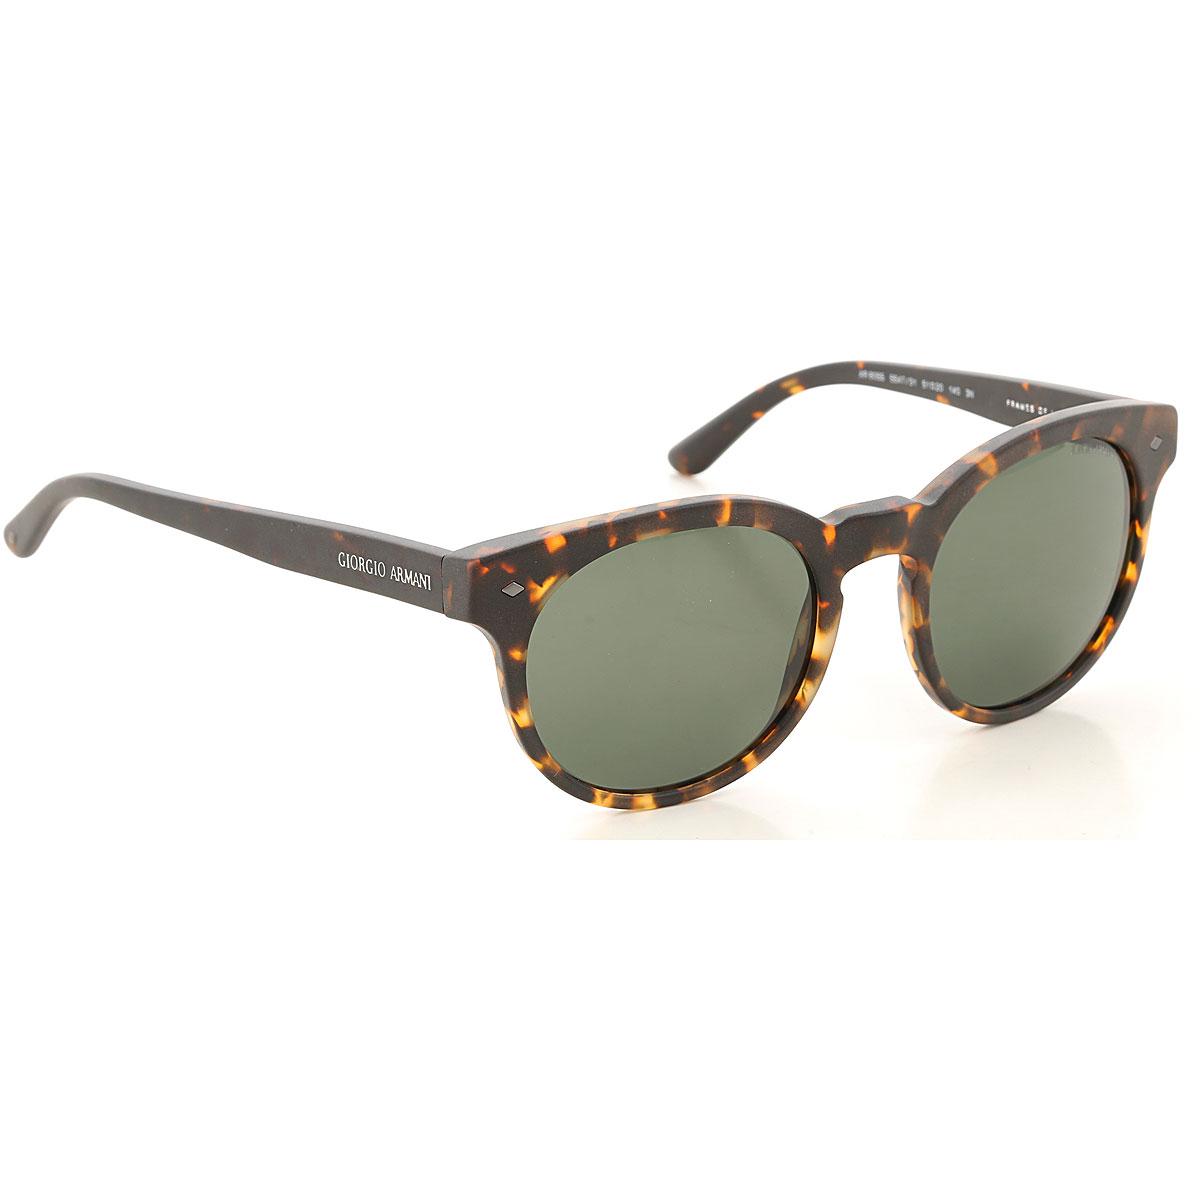 Giorgio Armani Sunglasses On Sale, Matt Havana, 2019